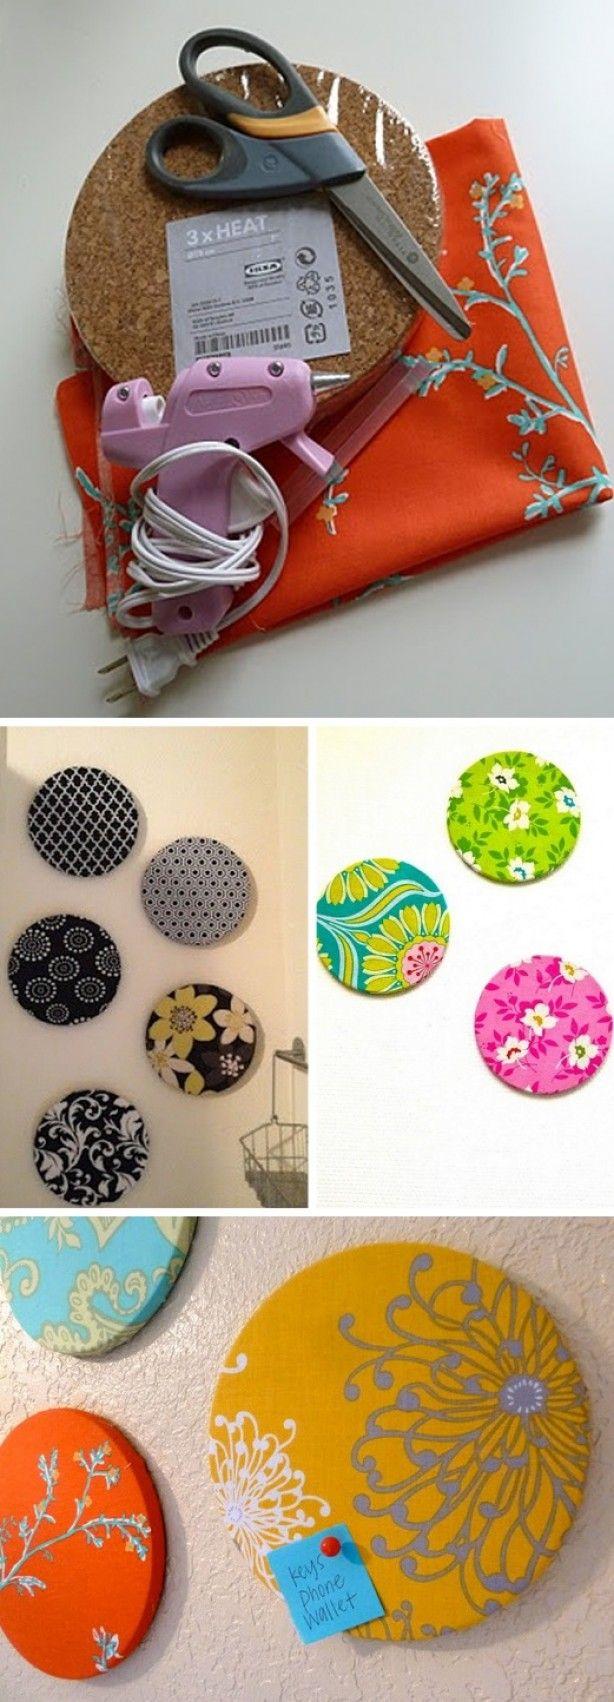 International Craft Patterns